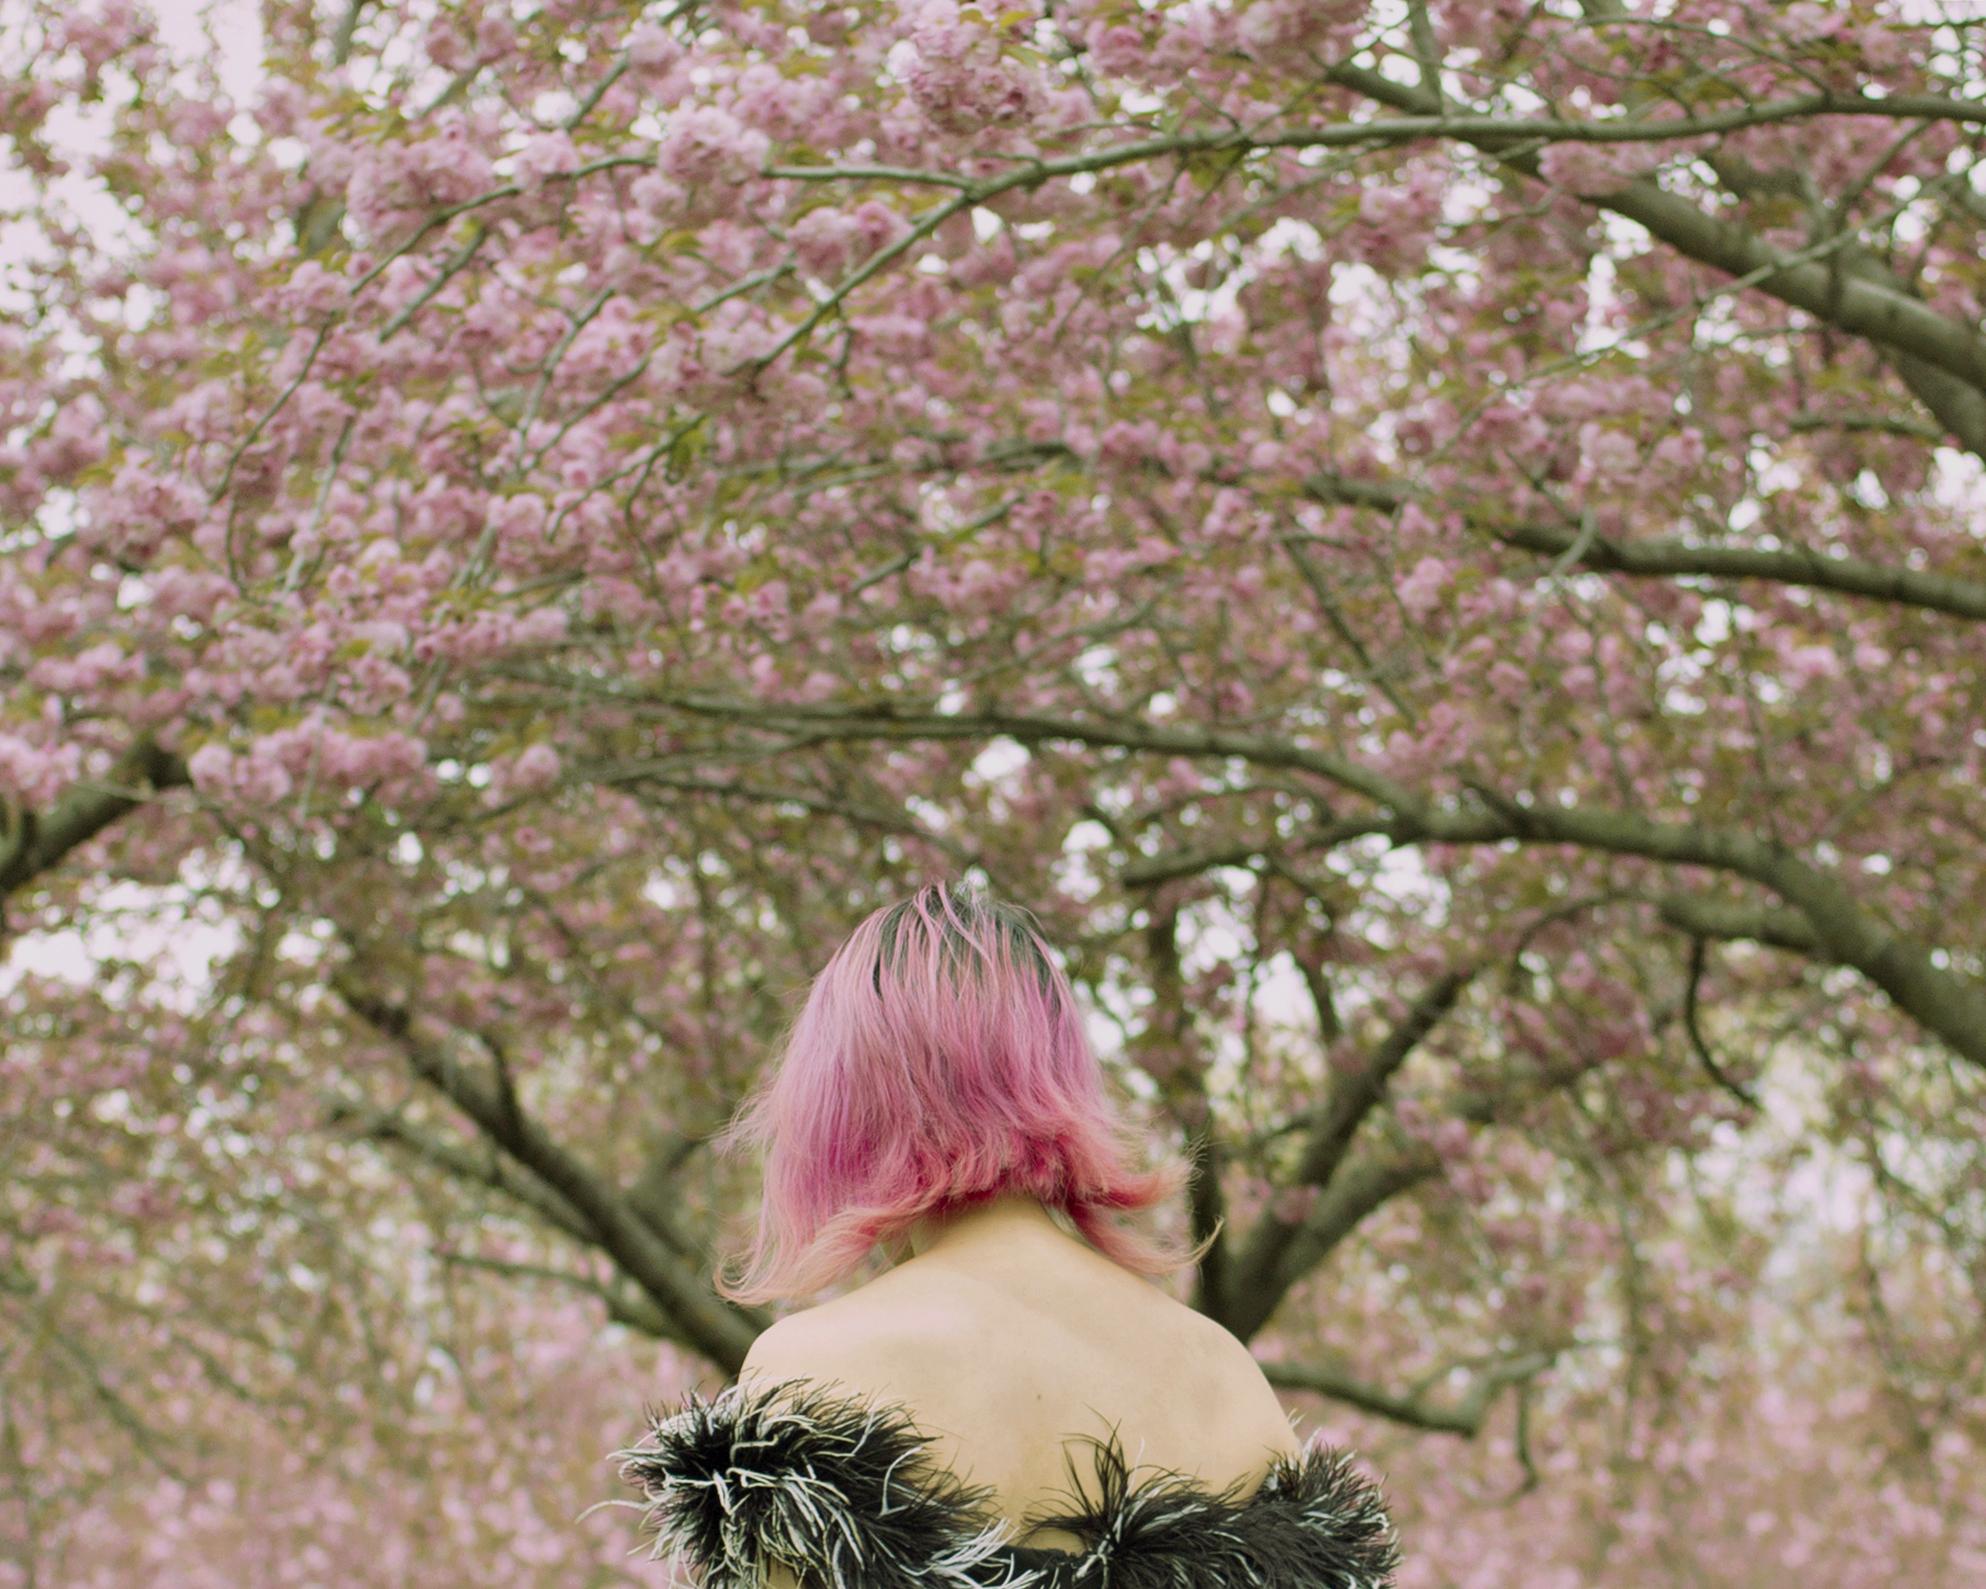 0017_Yen.BotanicalGarden_MaryKang.JPG